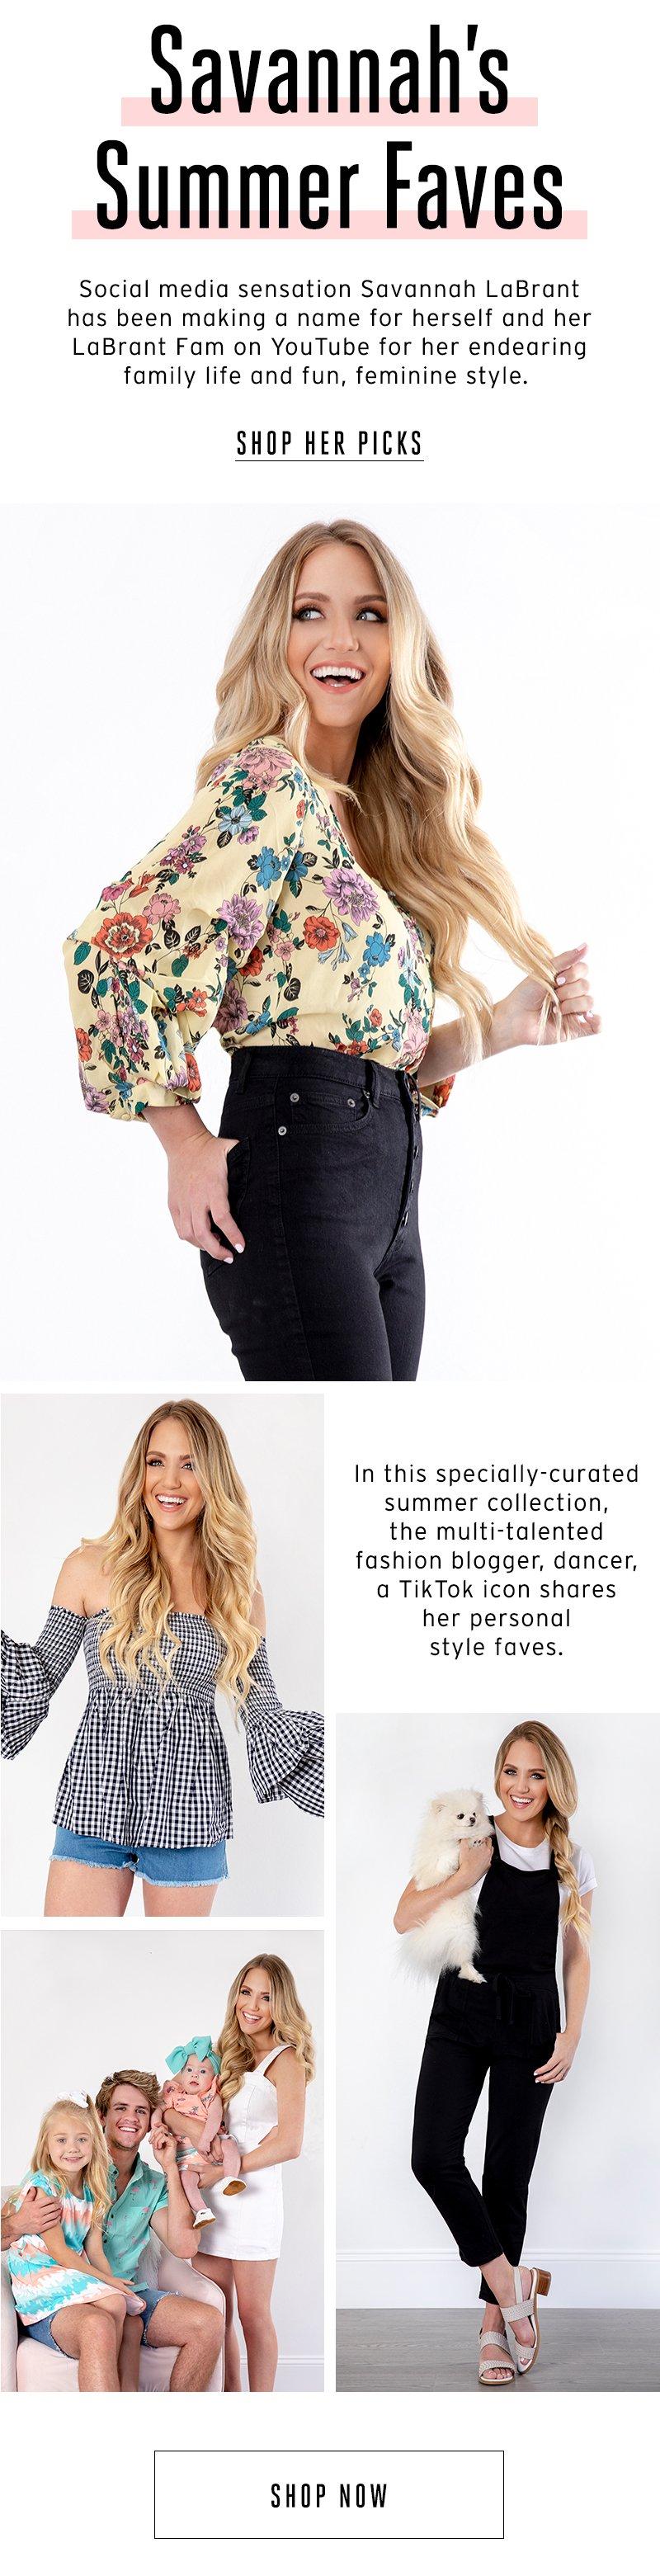 Savannah's Summer Faves. Shop her picks.